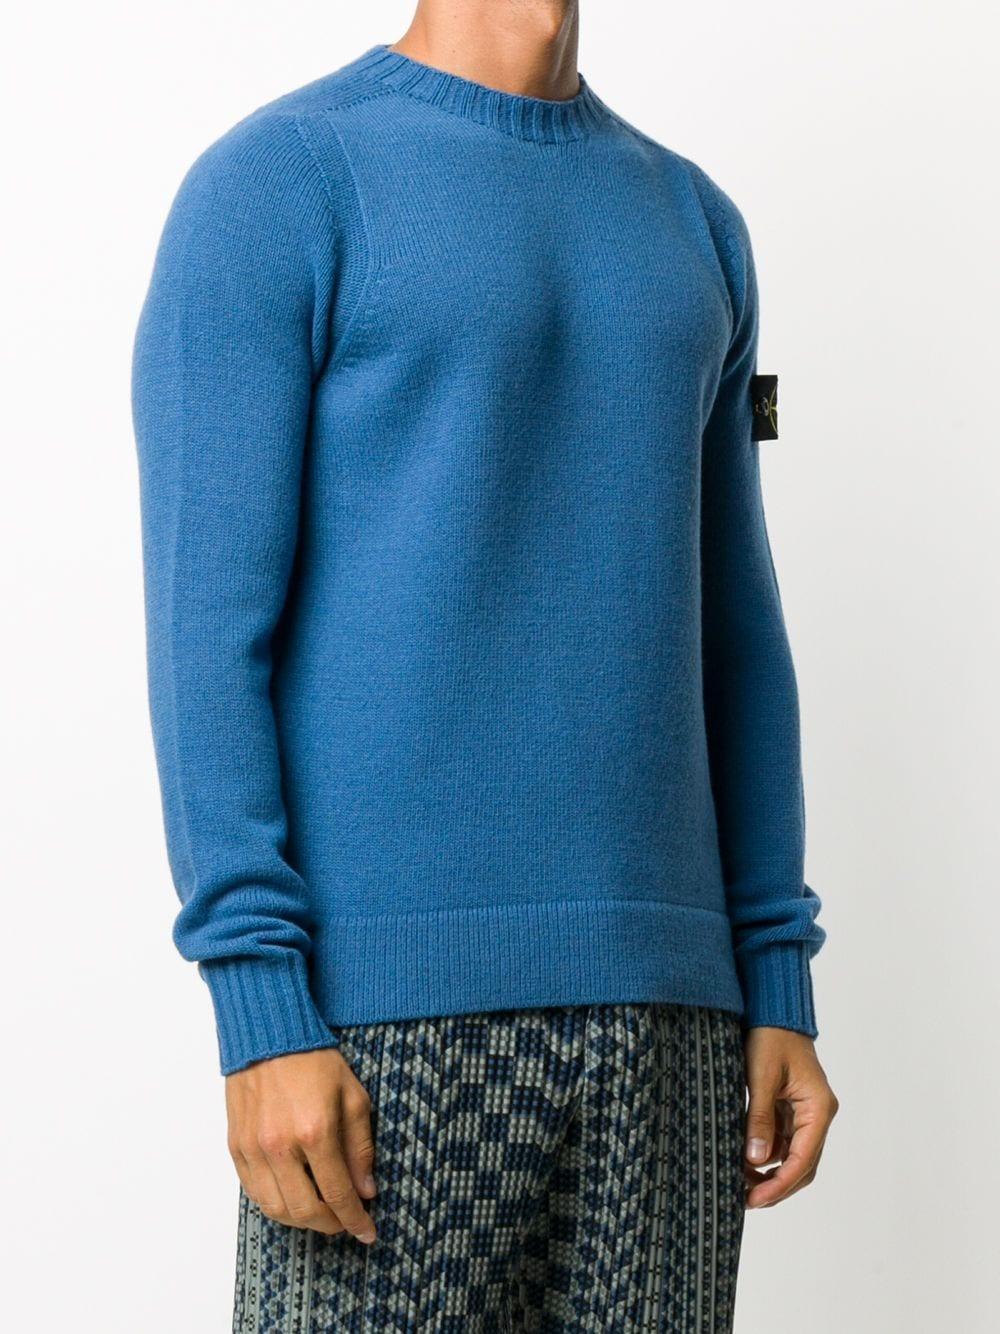 Blue wool crewneck jumper with Stone Island logo patch STONE ISLAND      7315505A3V0043